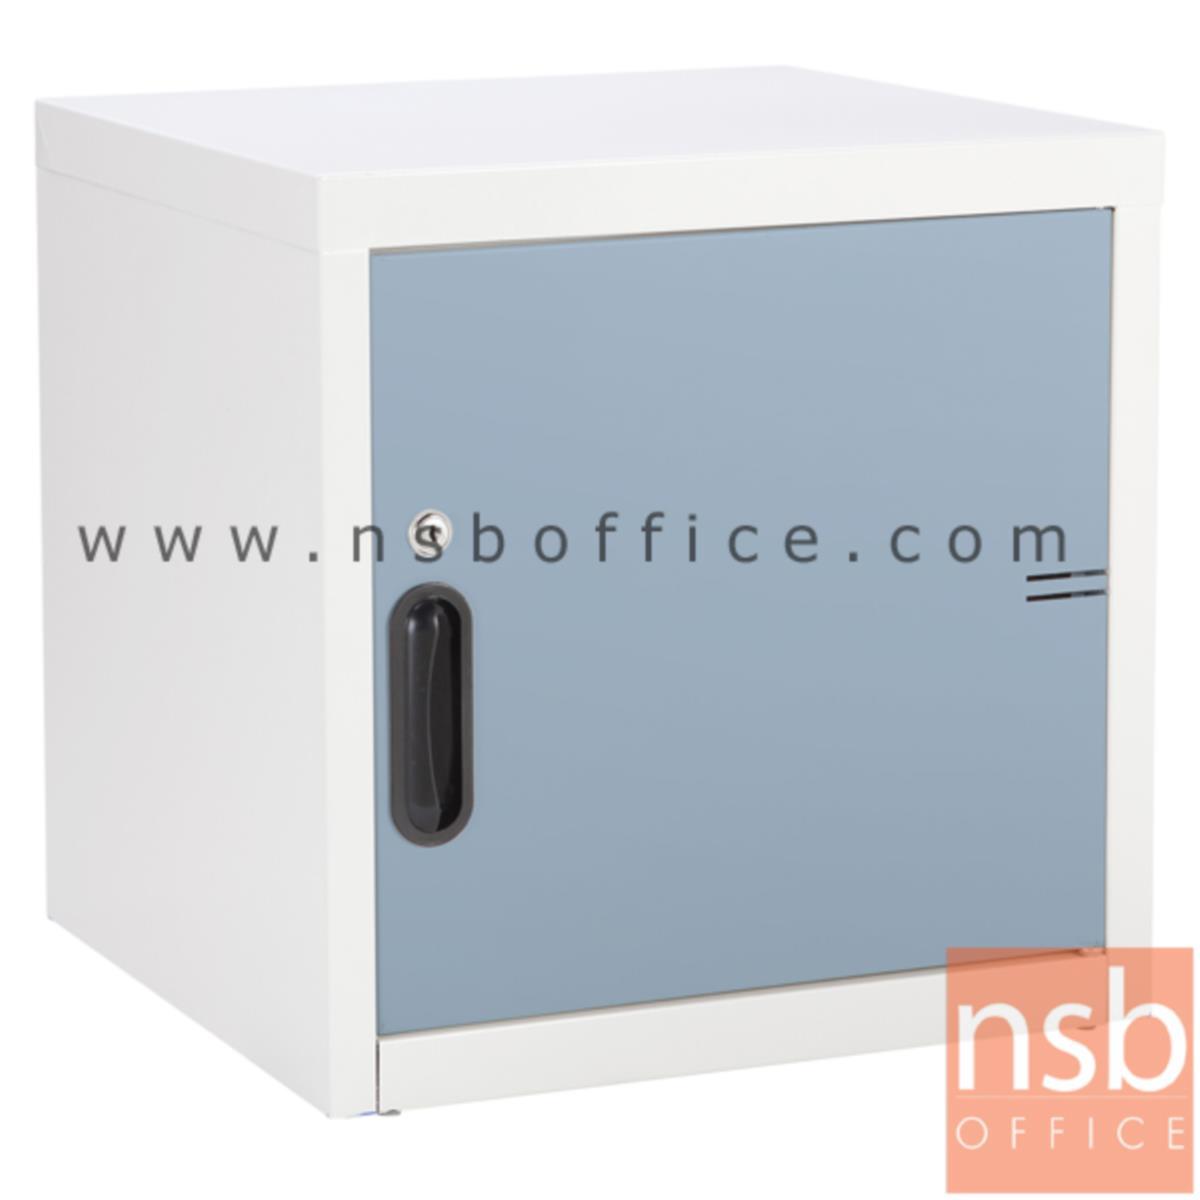 E25A001:ตู้เหล็ก 1 บานเปิดทึบ หน้าบานสีสัน 44W*40.7D*44H cm รุ่น UNI-1